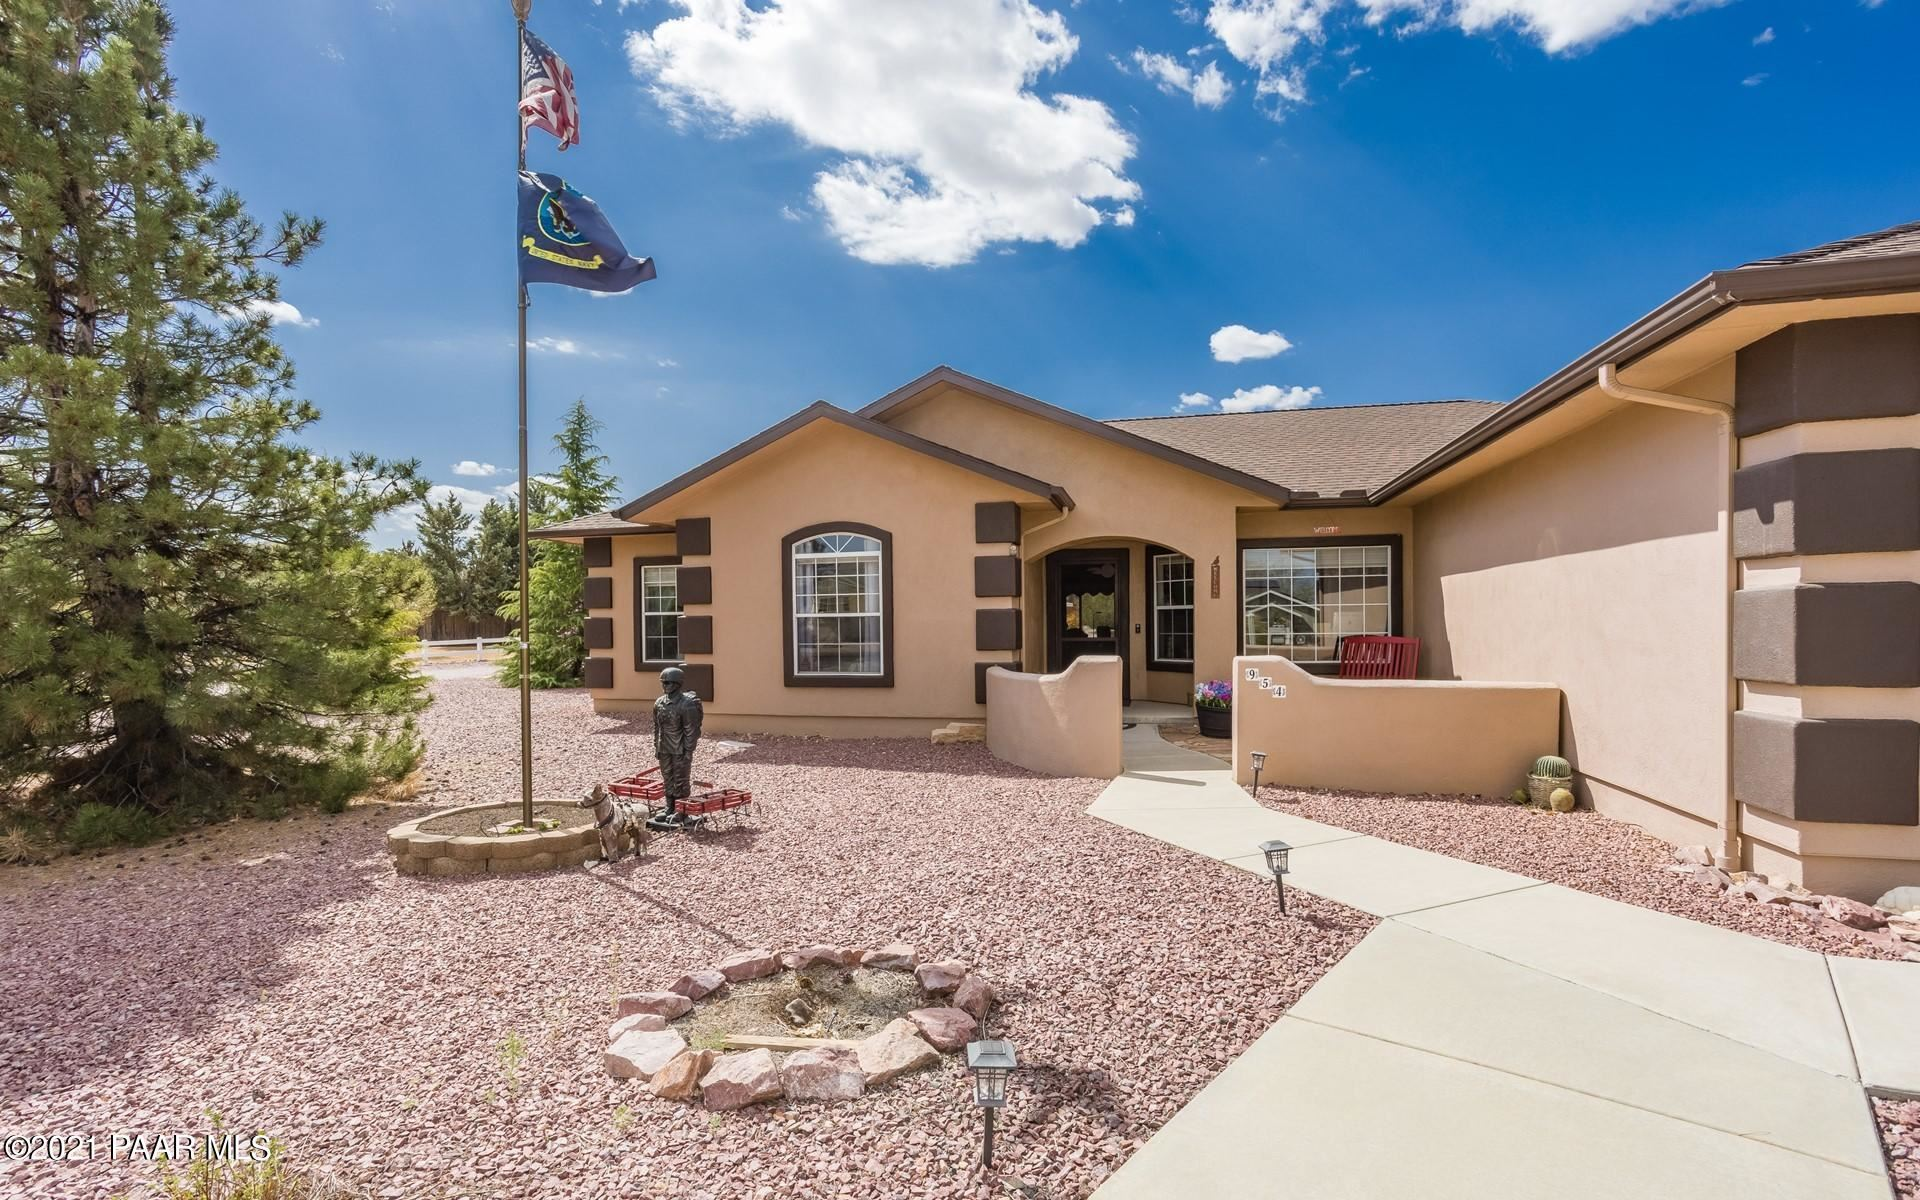 Photo of 954 Heather Lane #Lot: 53, Chino Valley, AZ 86323 (MLS # 1037666)